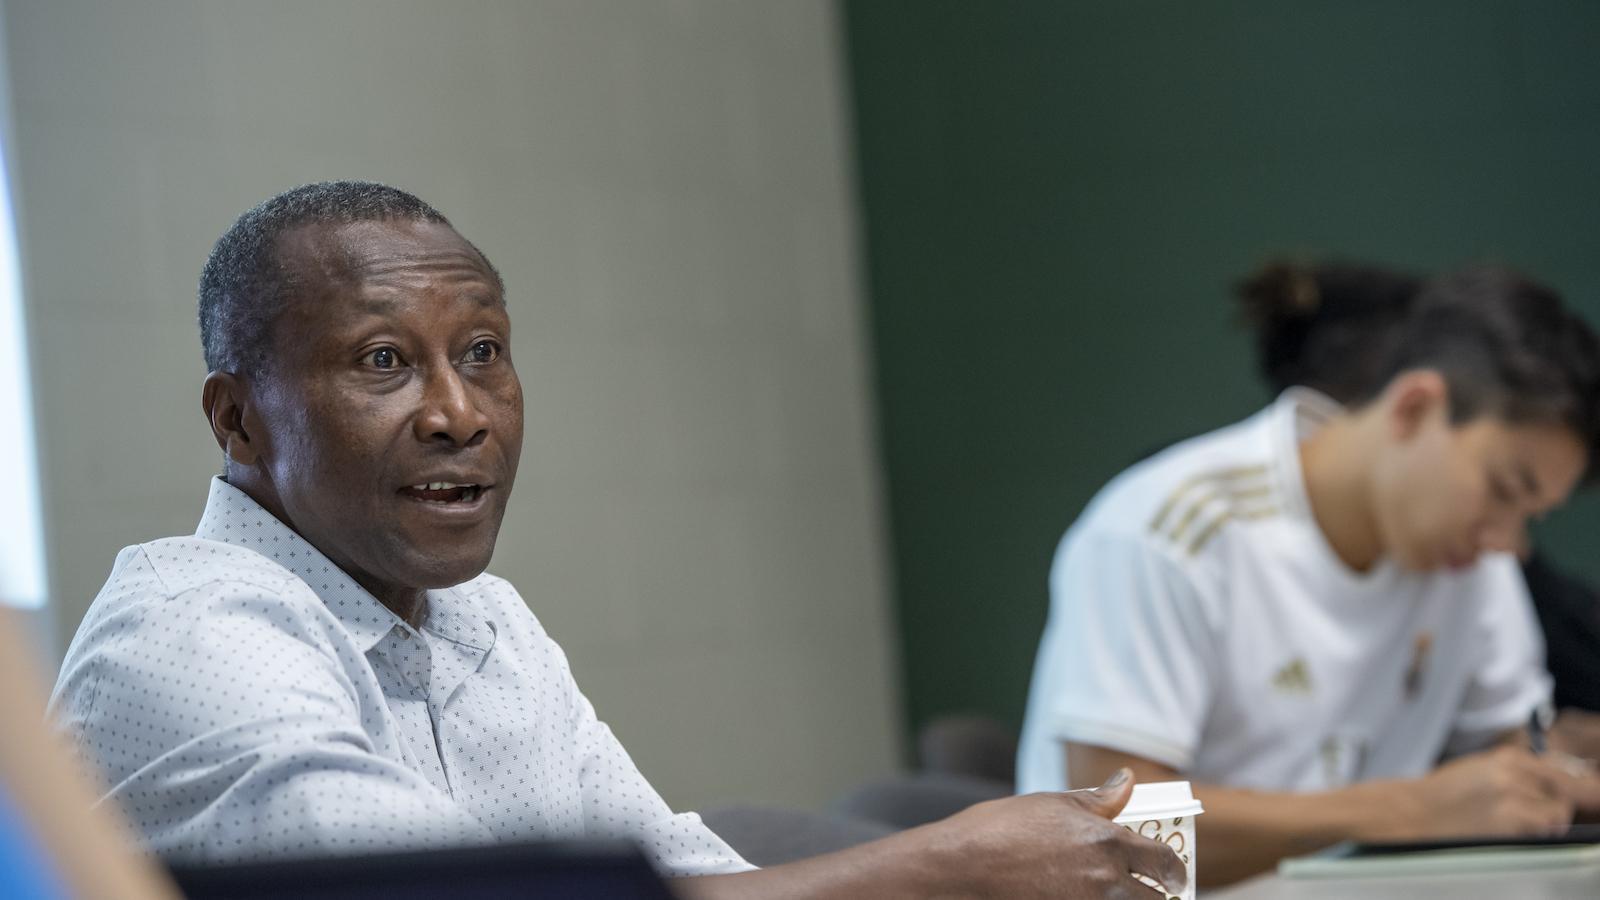 Professor Darko Opoku in class.